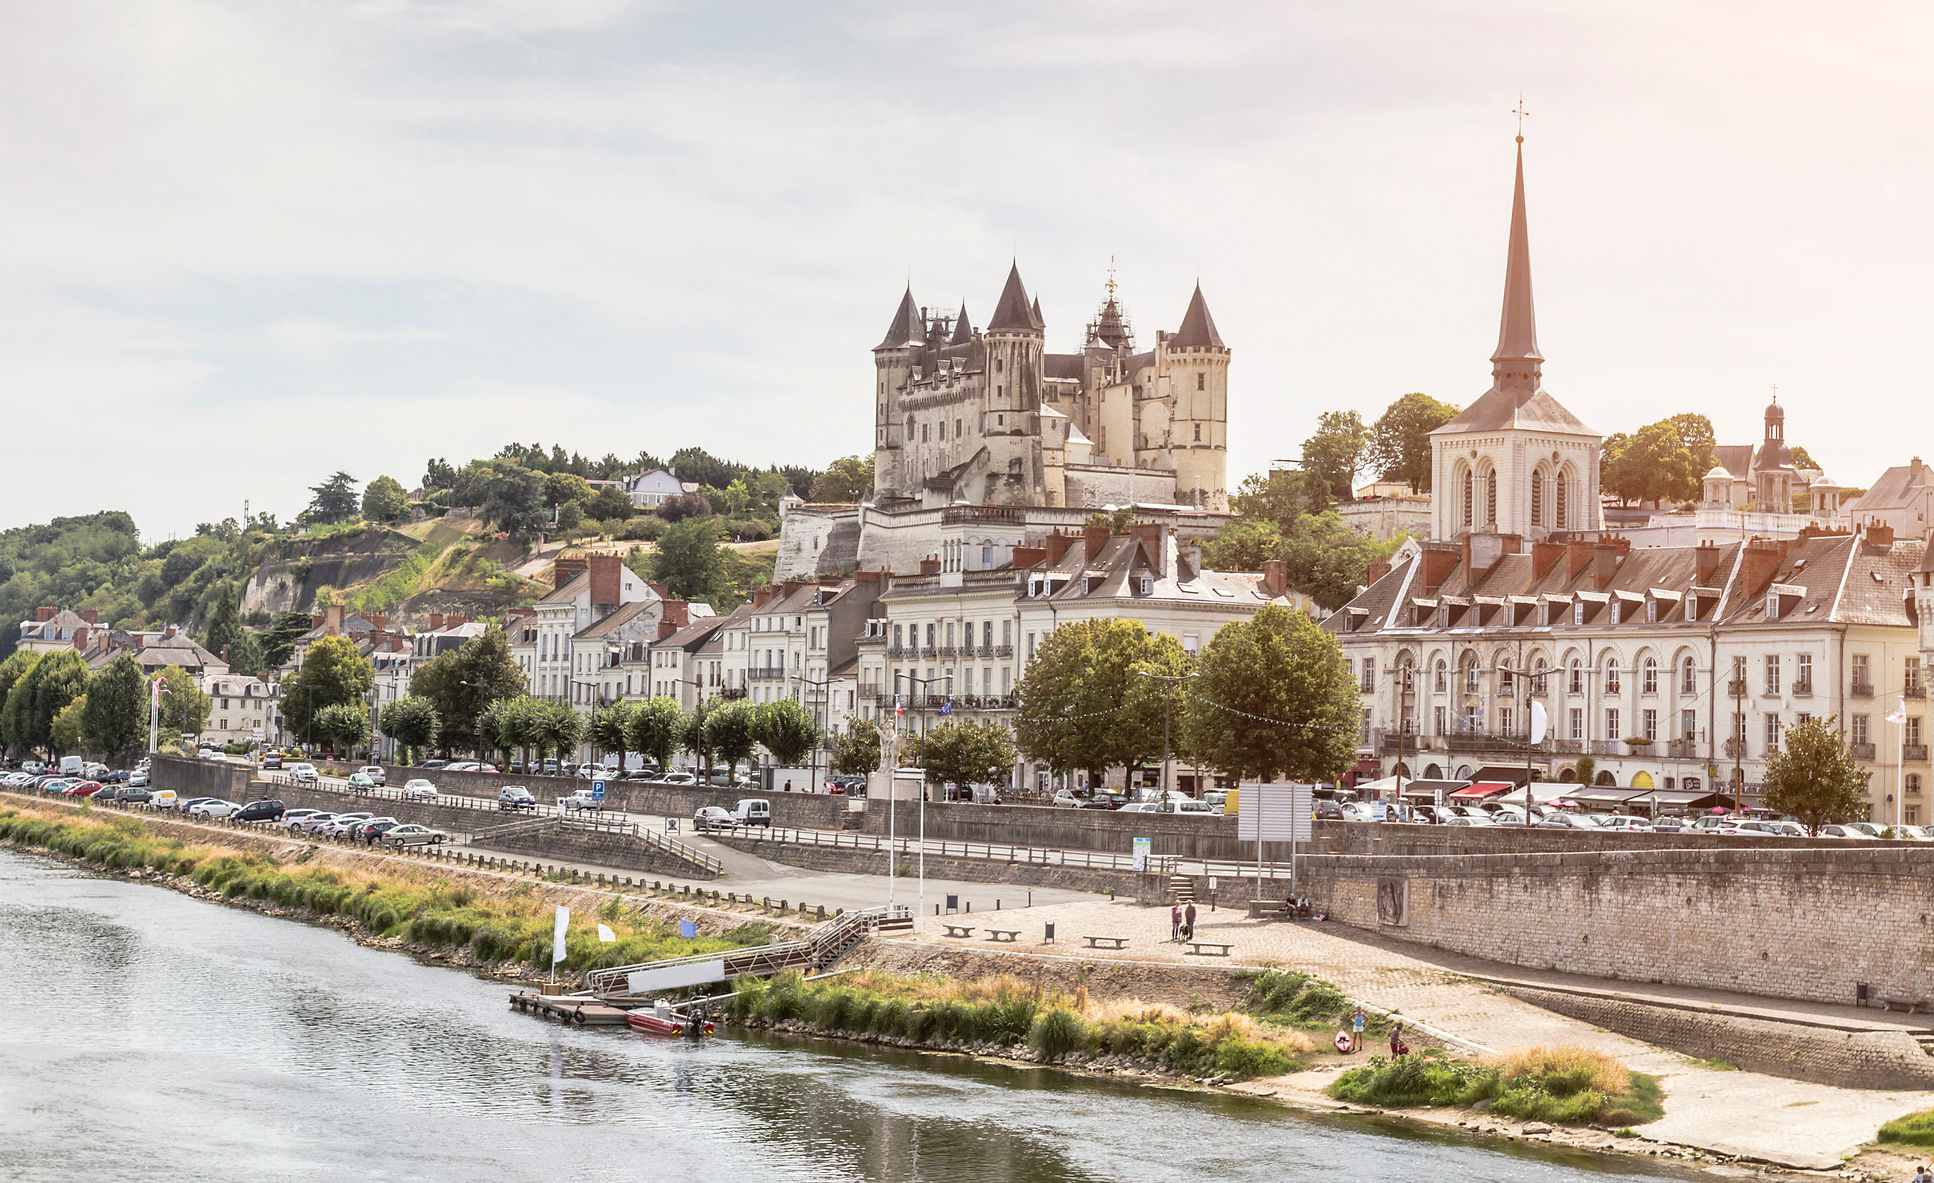 zámek Saumur | PJPhoto69